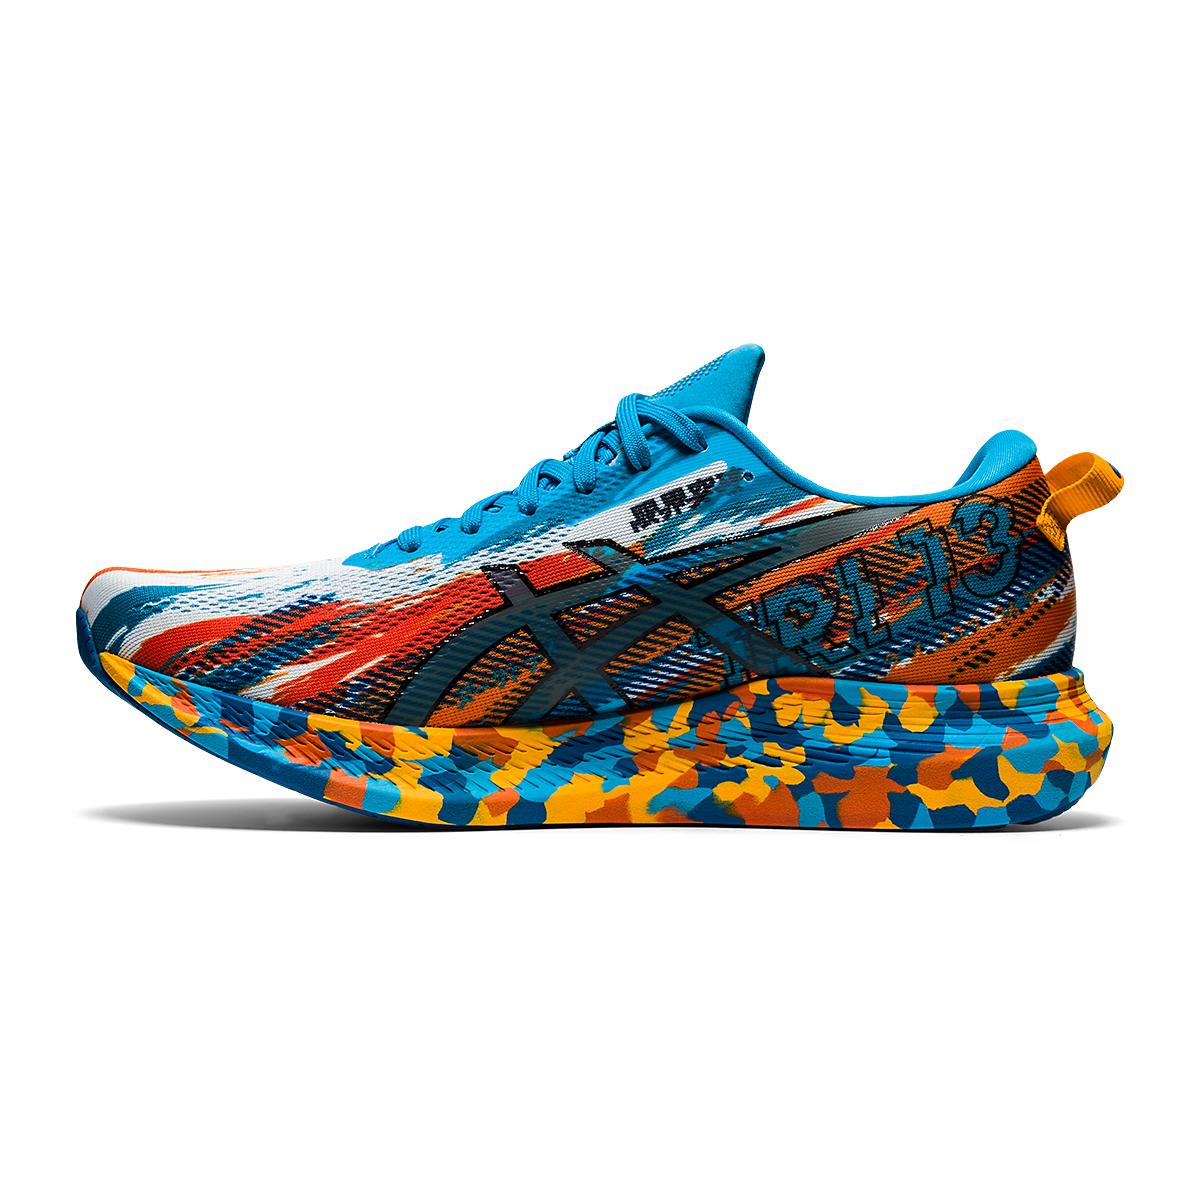 Men's Asics Noosa Tri 13 Running Shoe - Color: Digital Aqua/Ma - Size: 7 - Width: Regular, Digital Aqua/Ma, large, image 2